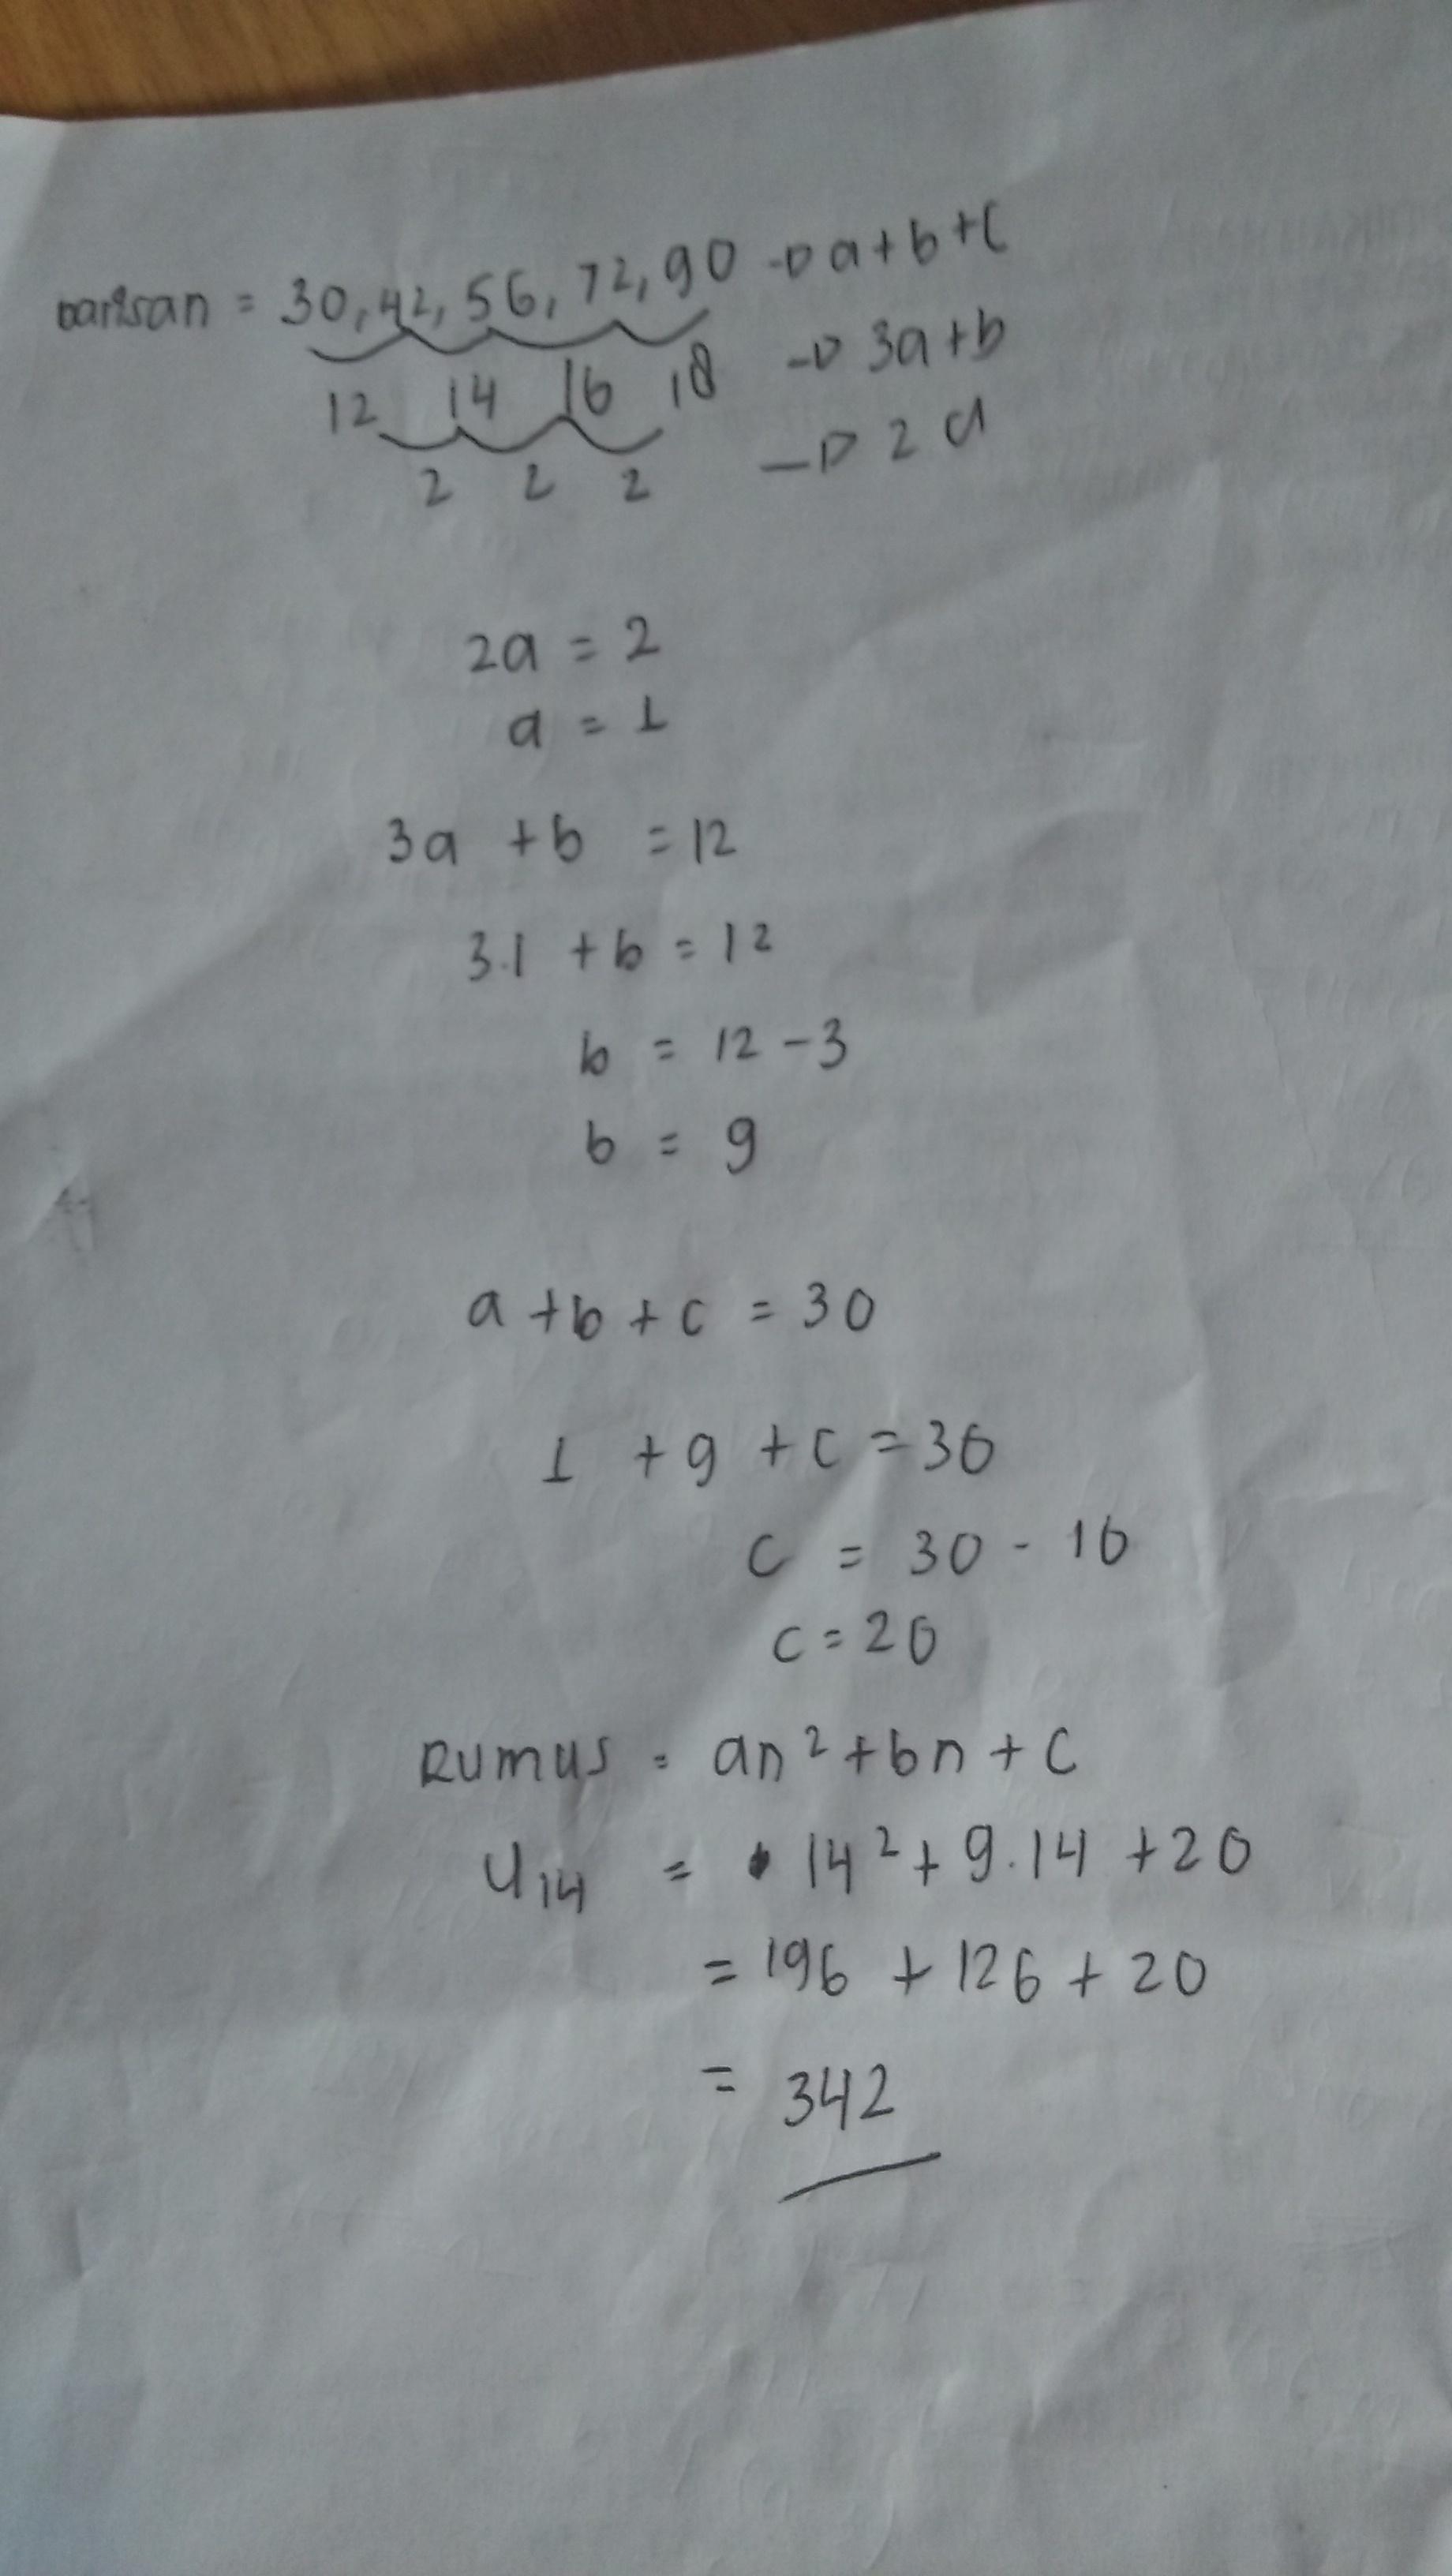 diketahui barisan bilangan 30,42,56,72,90,... suku ke-14 ...